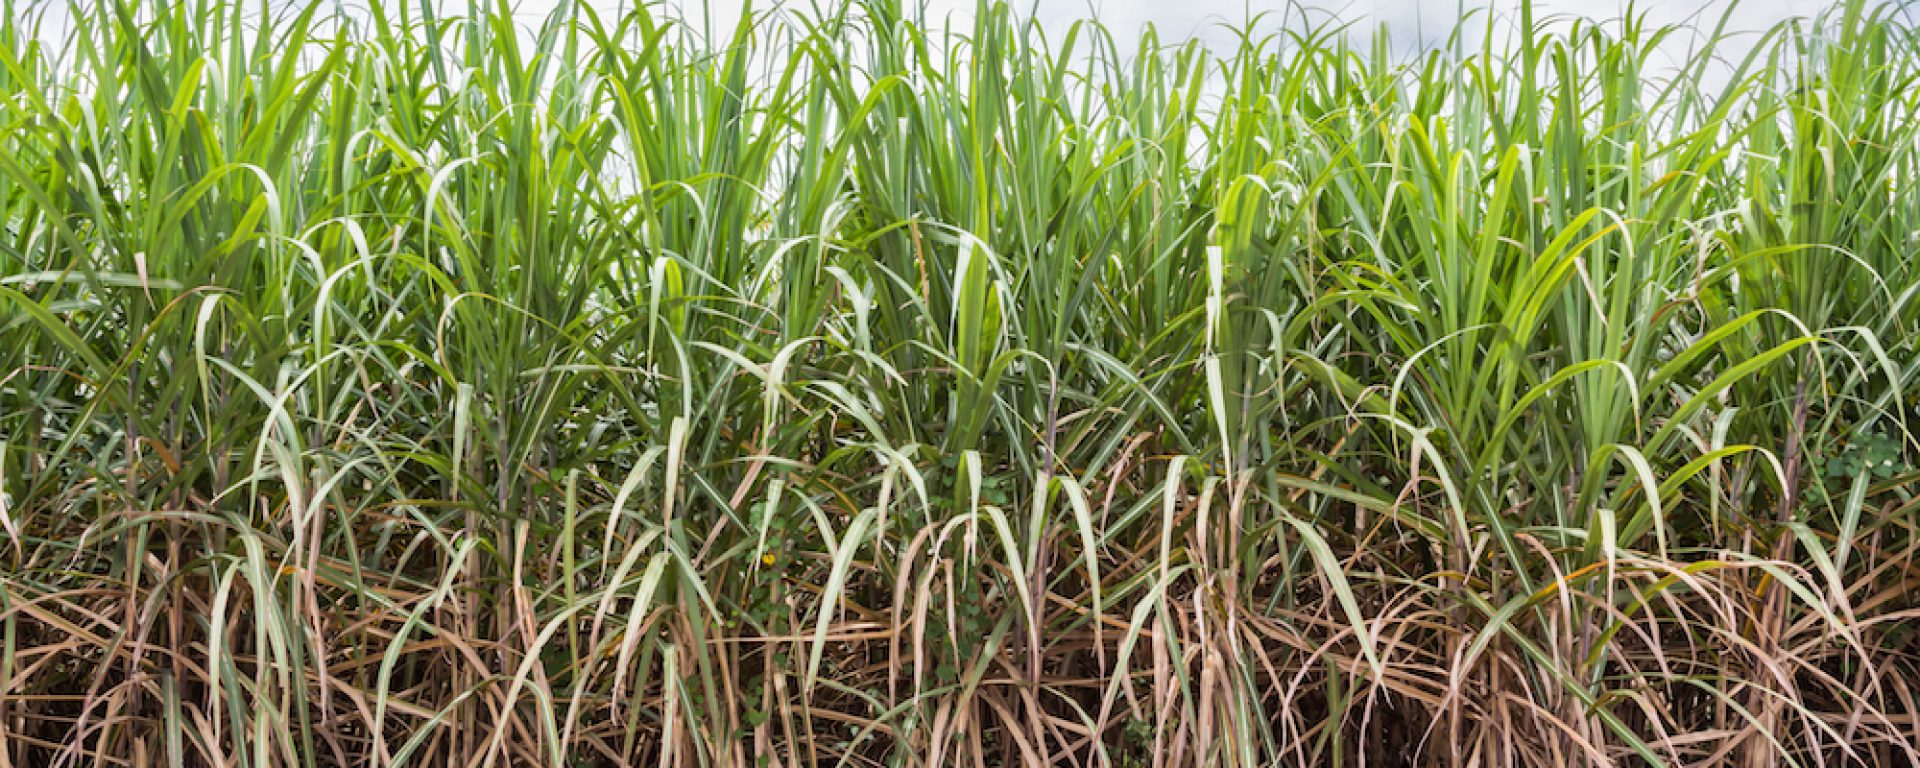 Sugarcane 2